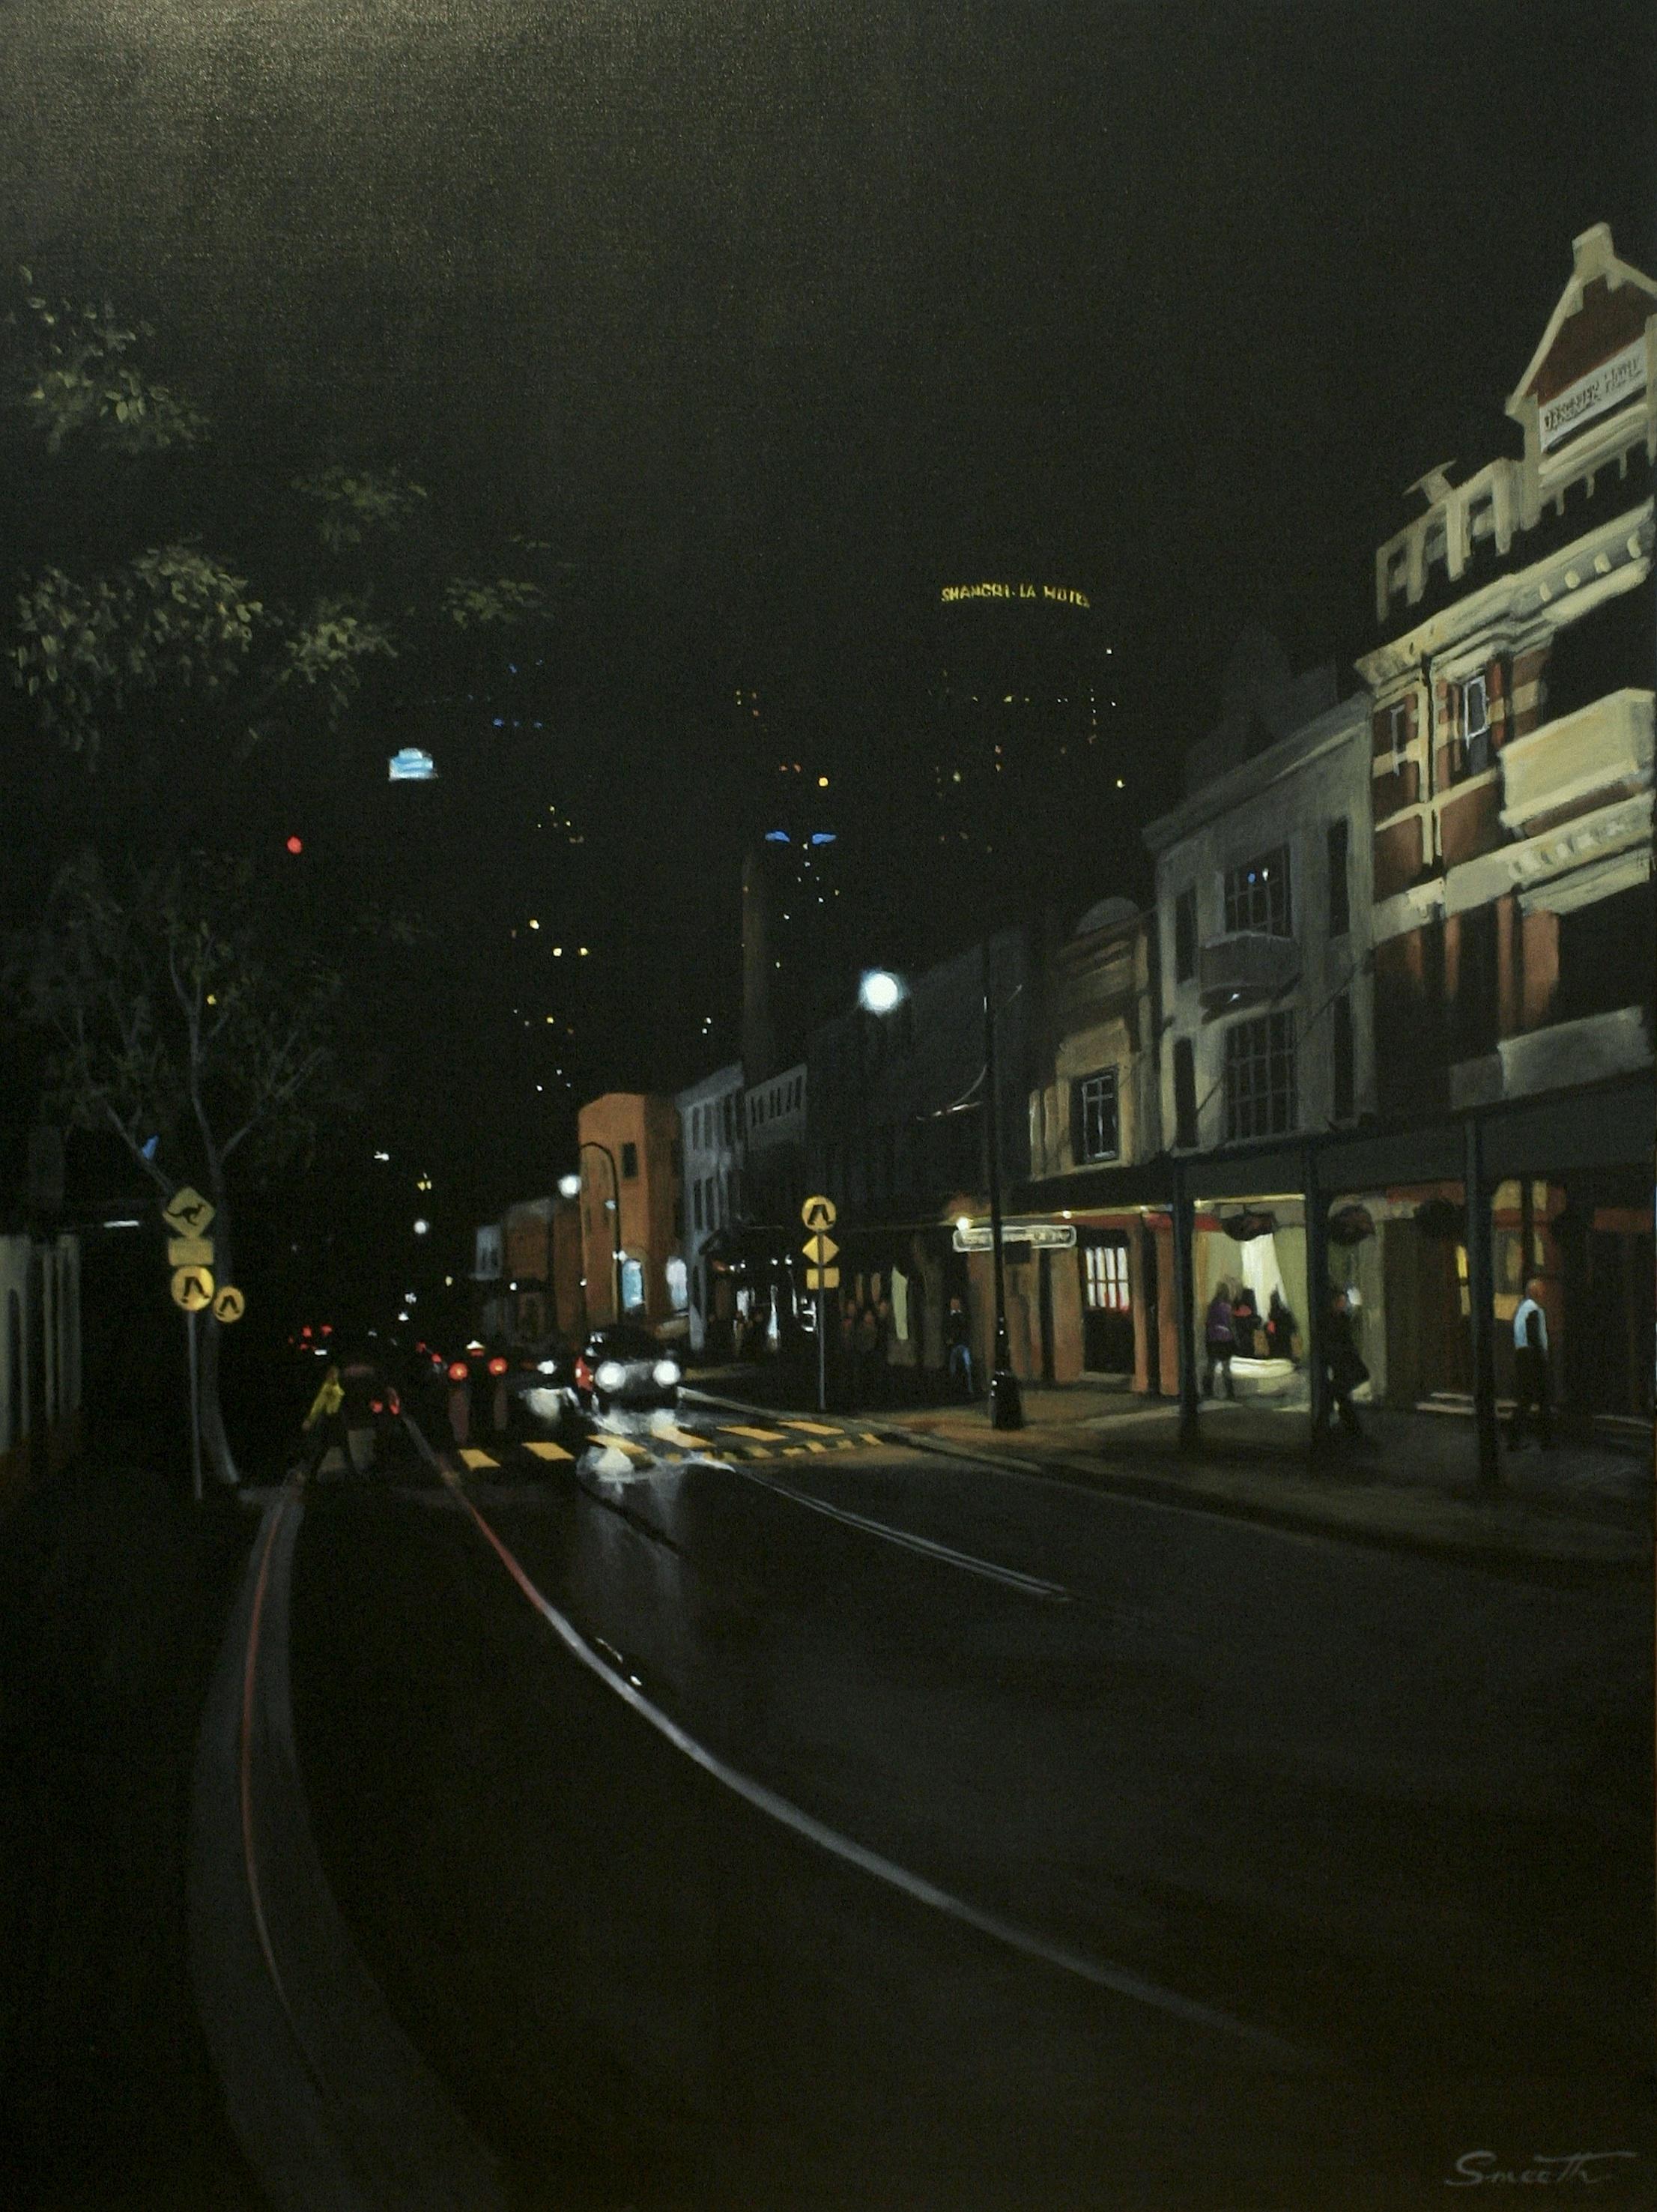 6Night Lights Symphony - The Rocks, Sydney Australia 2005. Acrylic on canvas 120x90cm $8,000